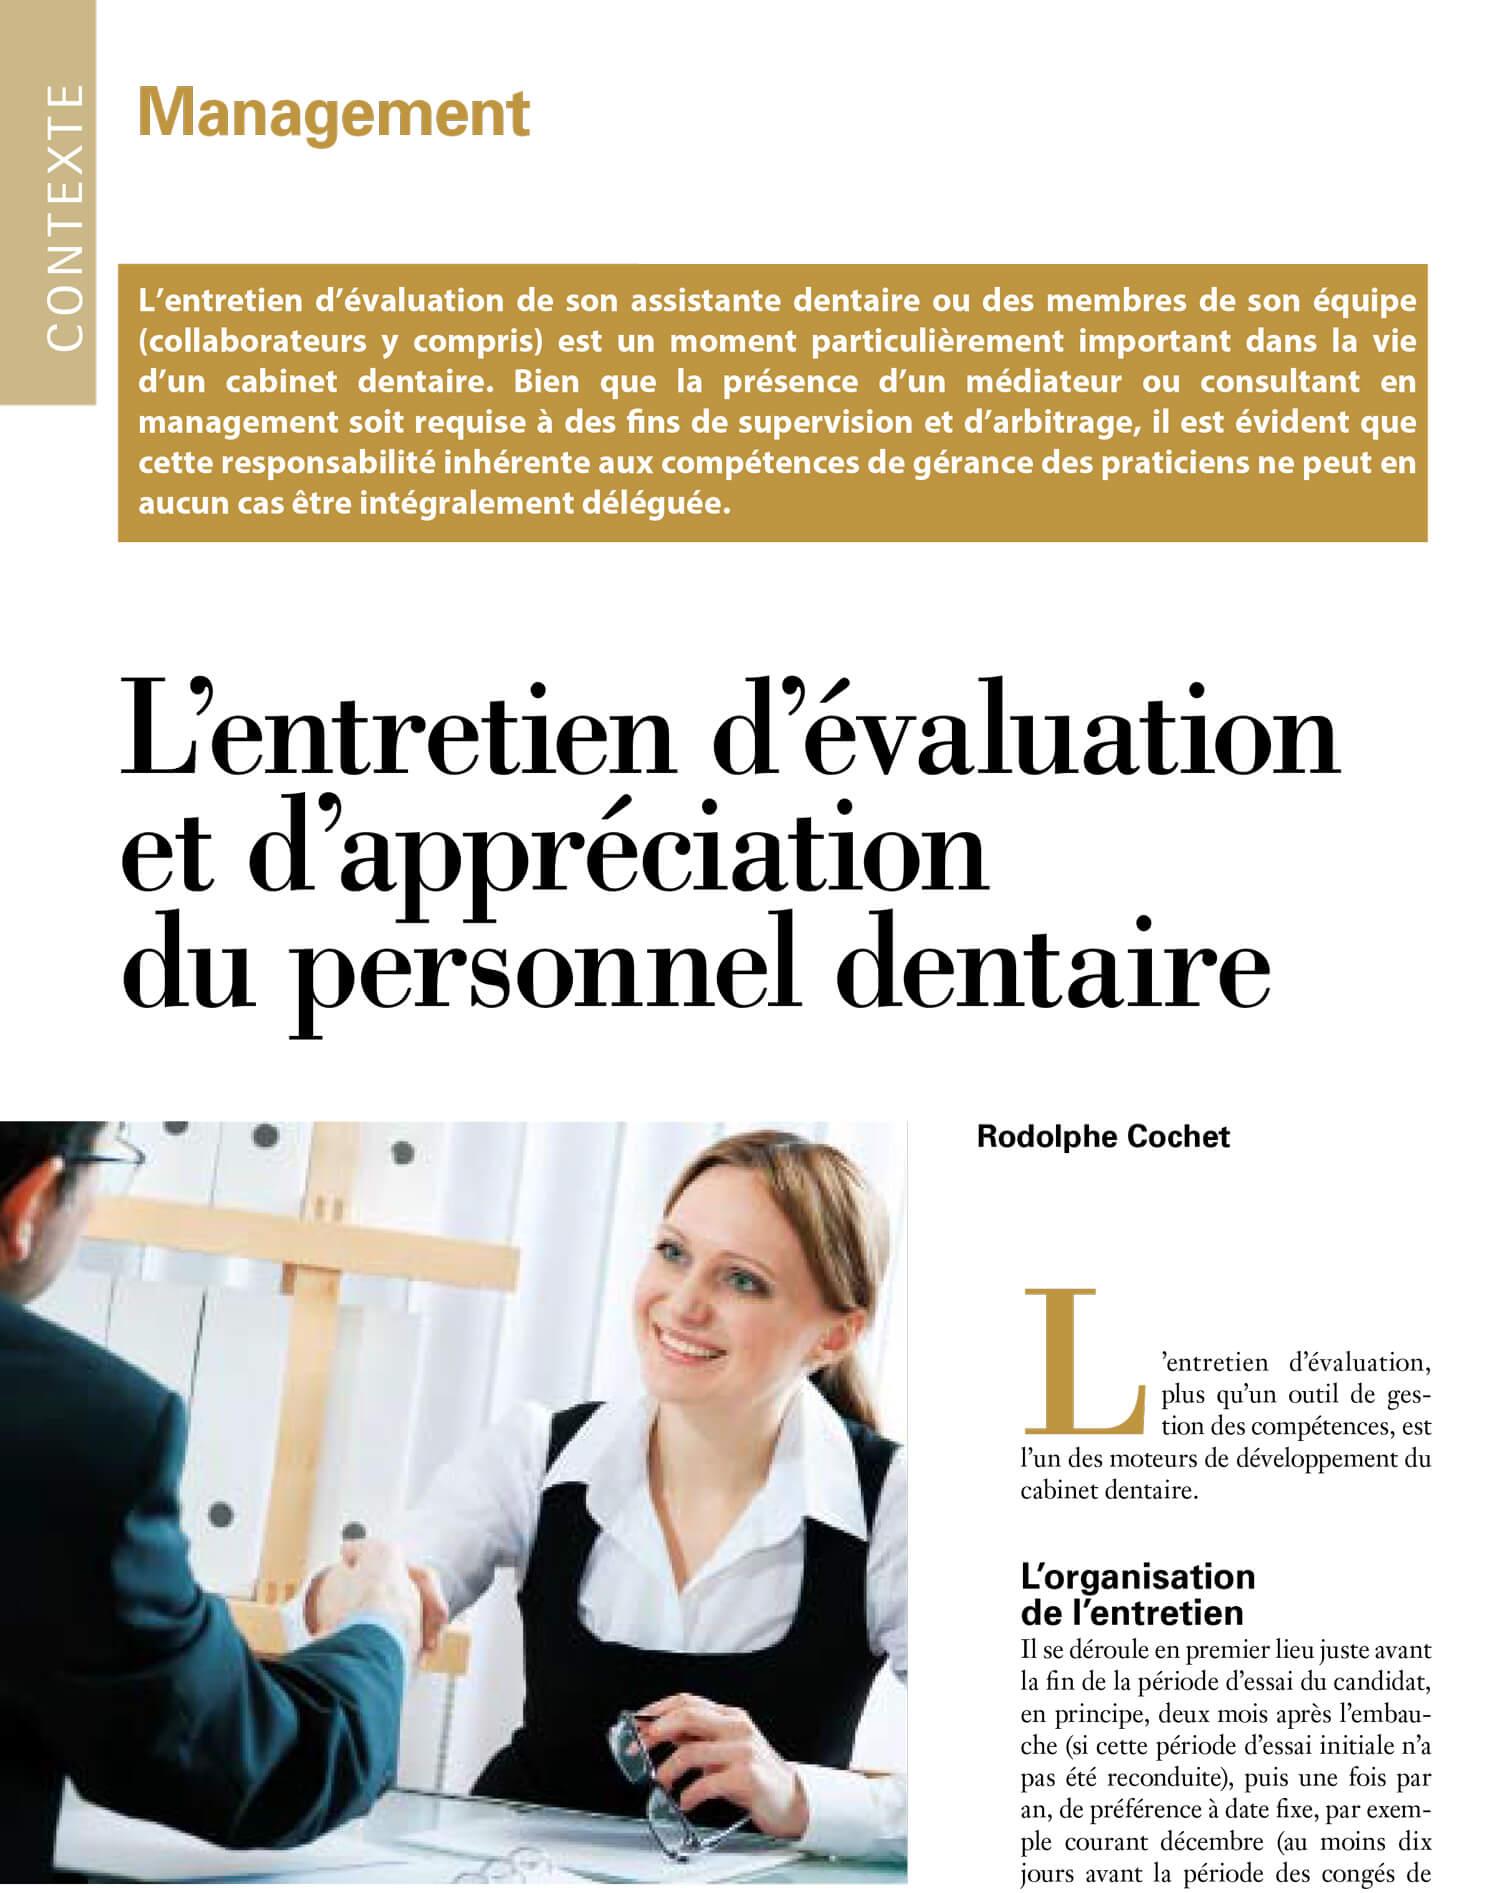 Entretien-evaluation-appreciation-annuel-personnel-cabinet-dentaire-rodolphe-cochet.jpg